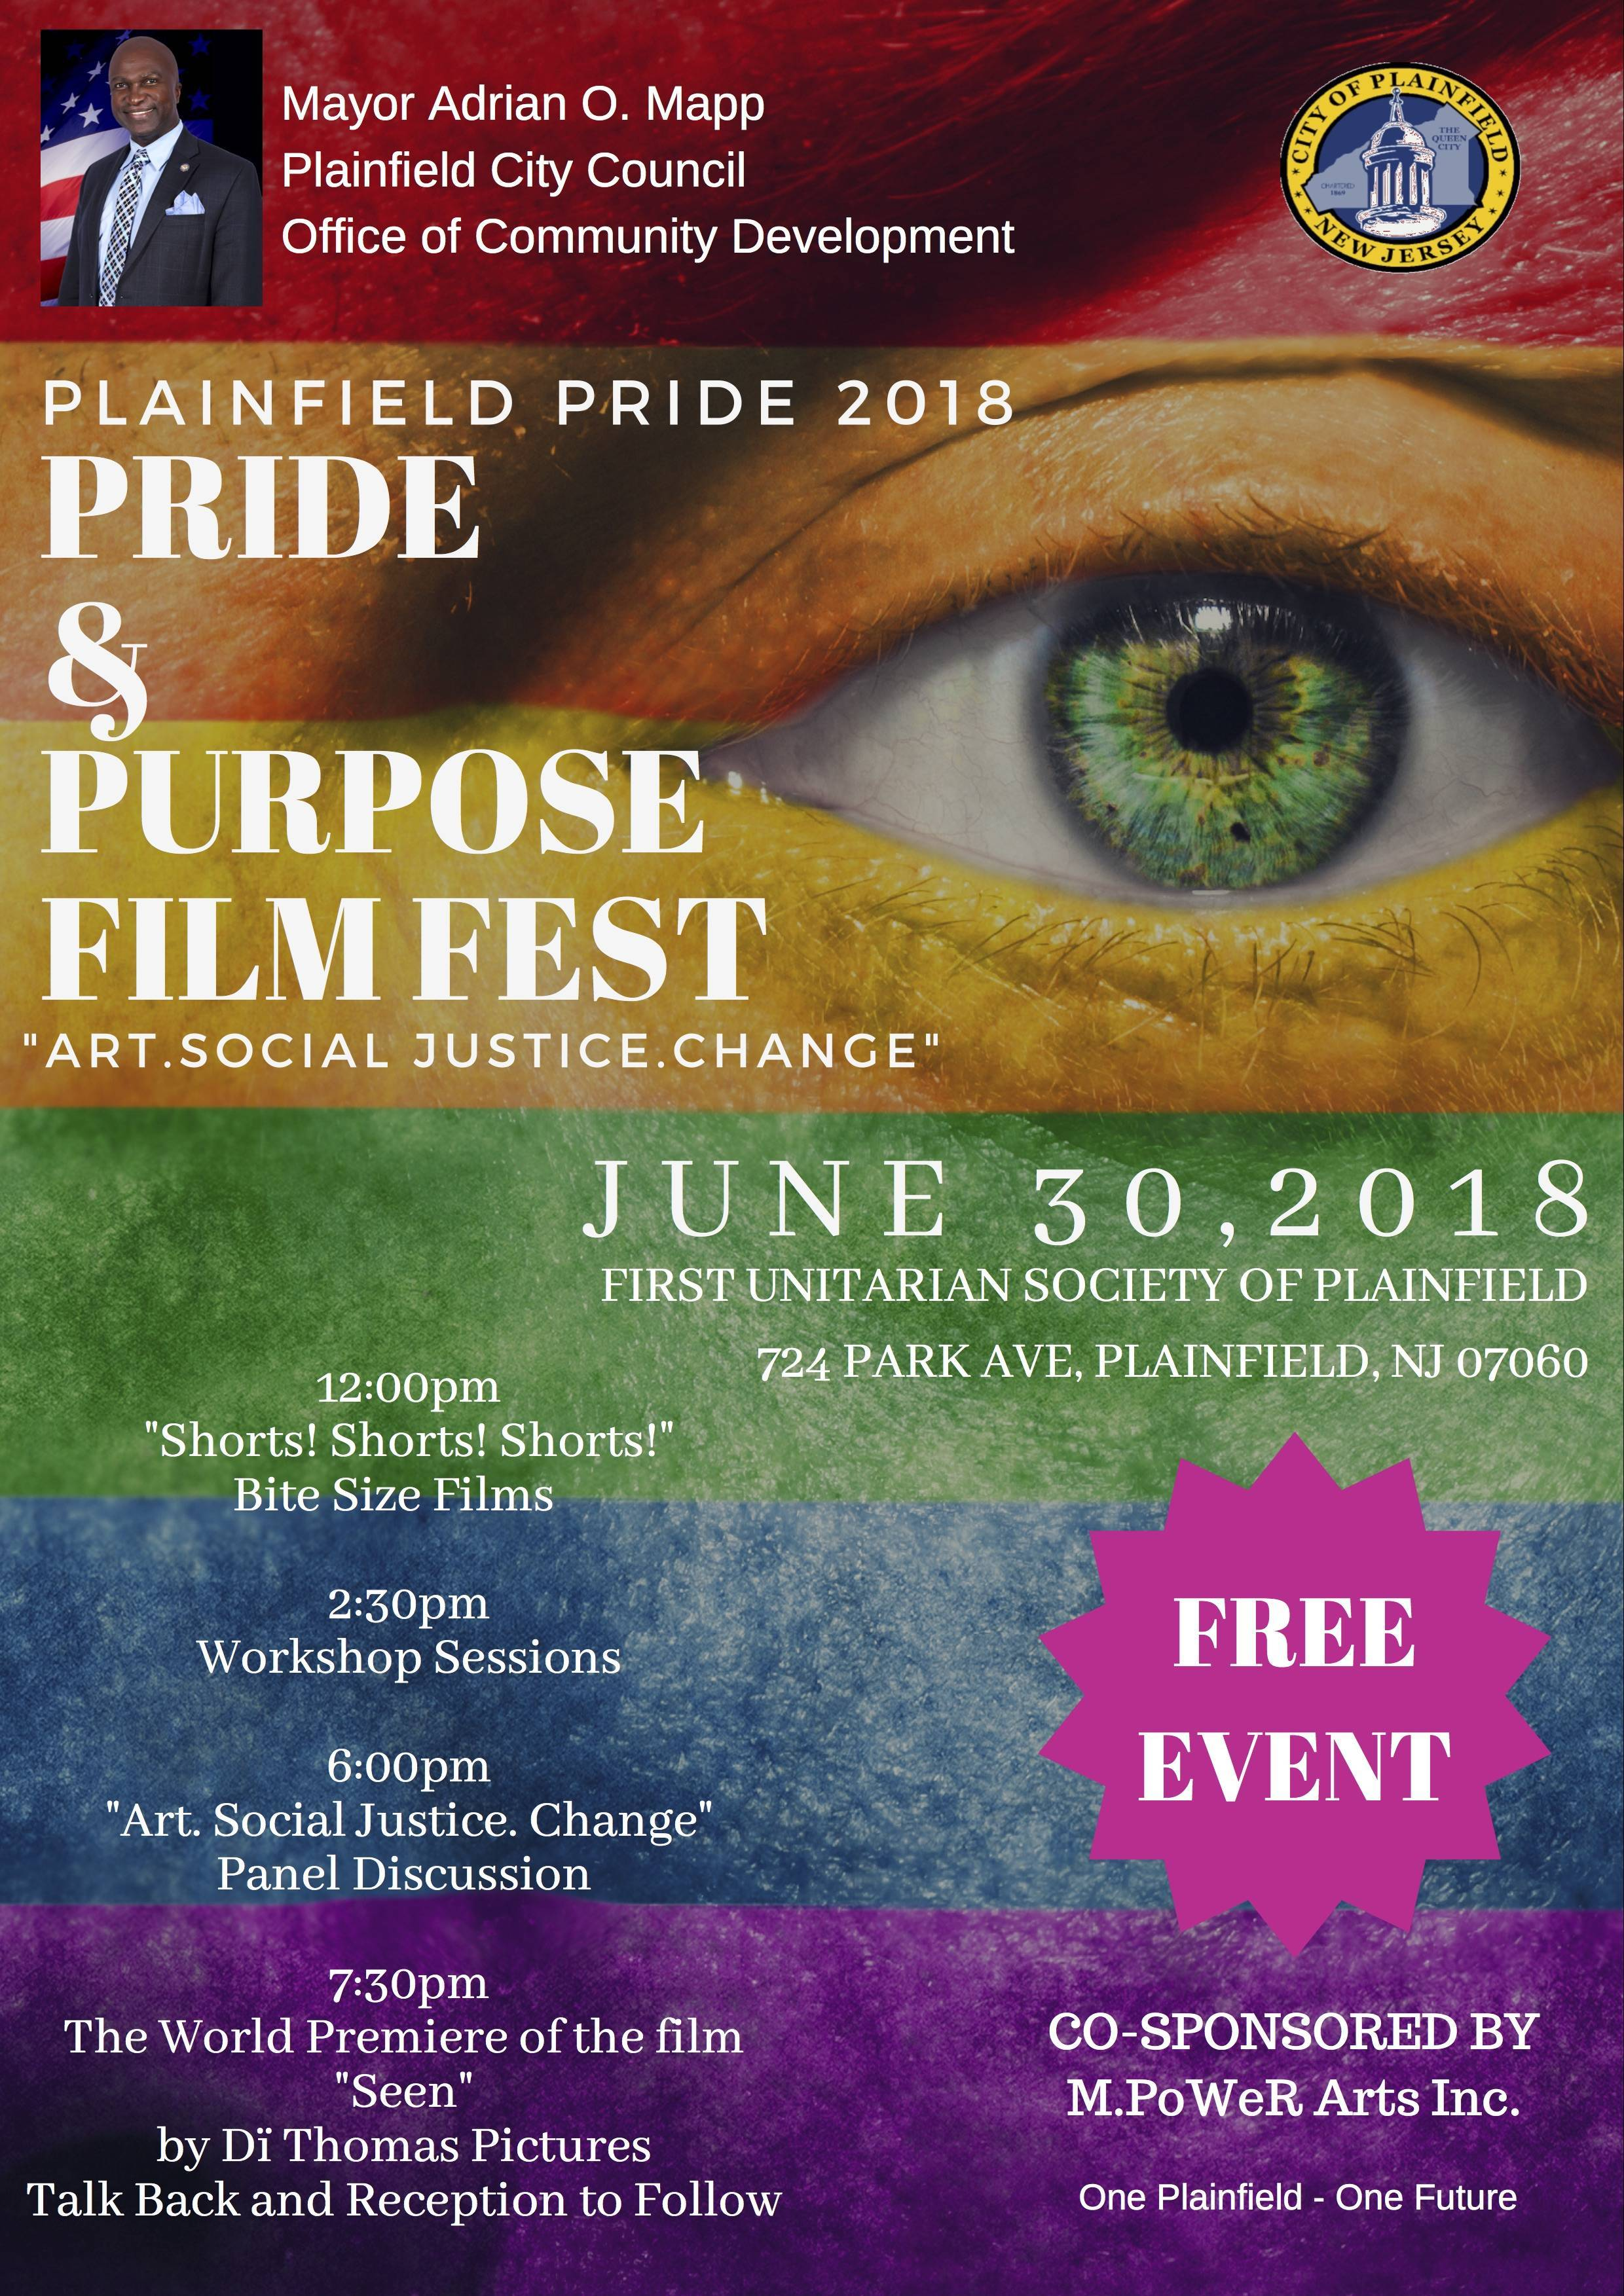 8d7fac8013bd418d928e_Pride_poster_.jpg